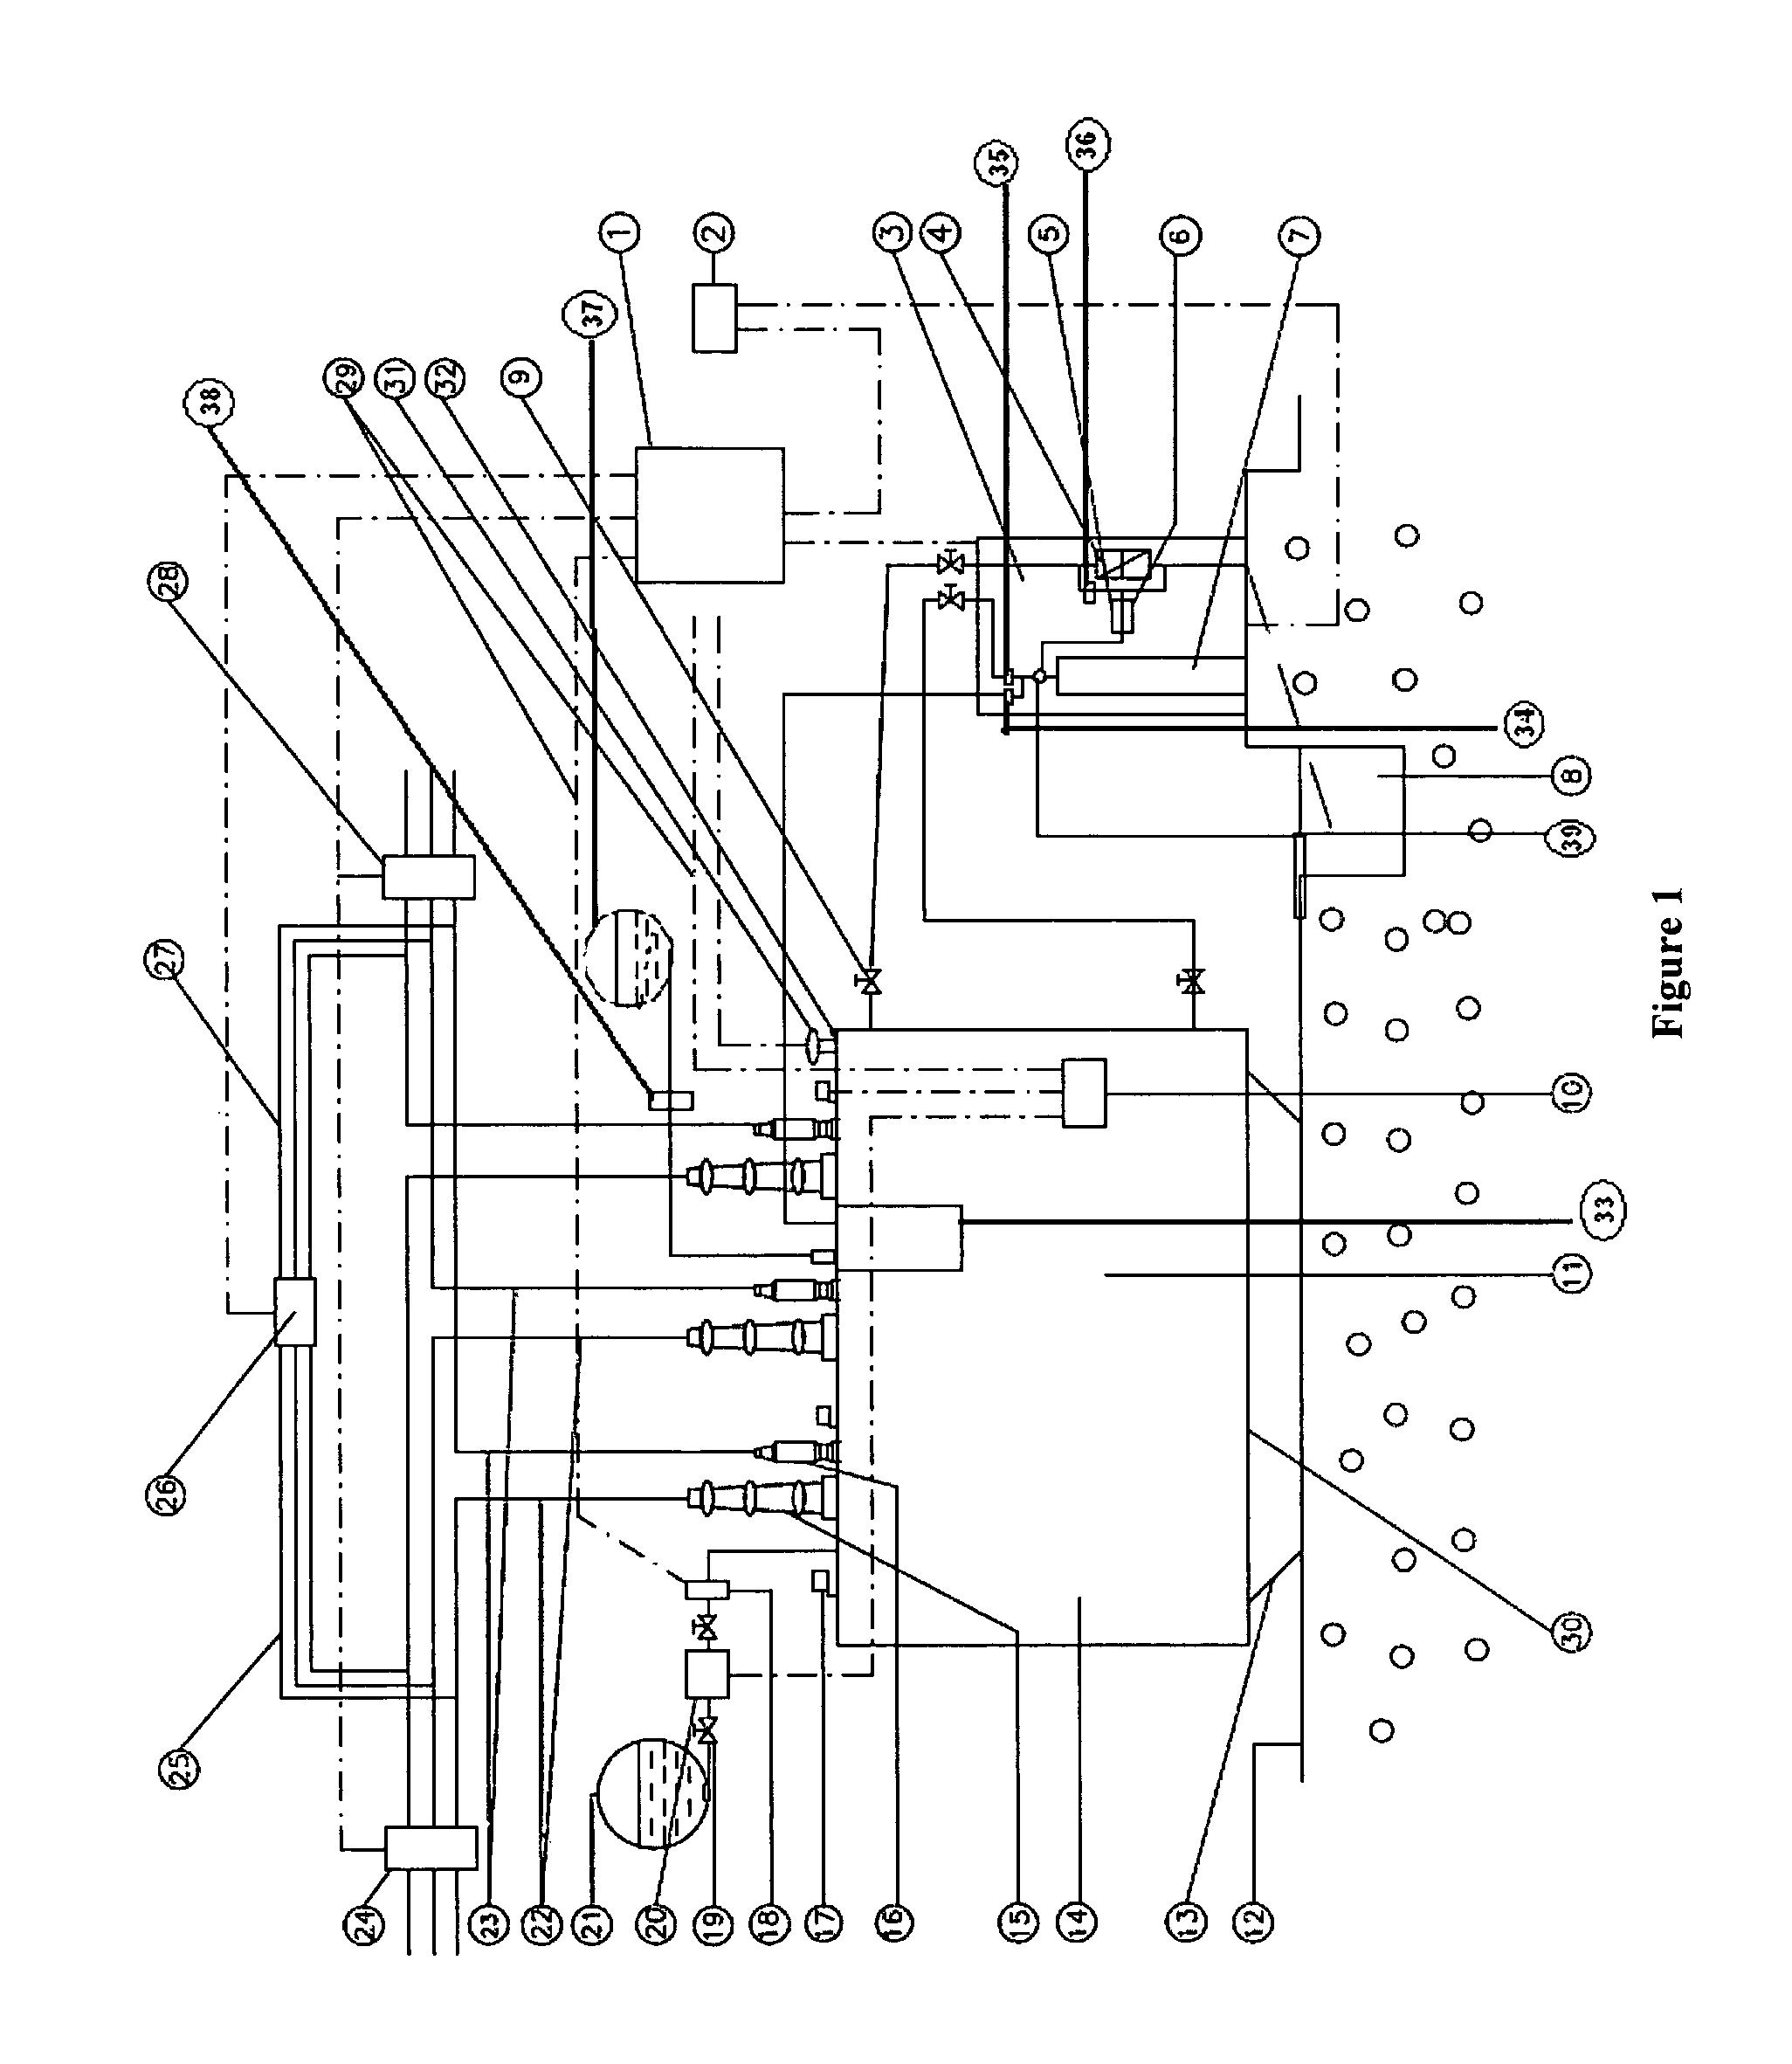 Wiring Diagram Likewise Nissan Maxima Wiring Diagram Manual On 1990